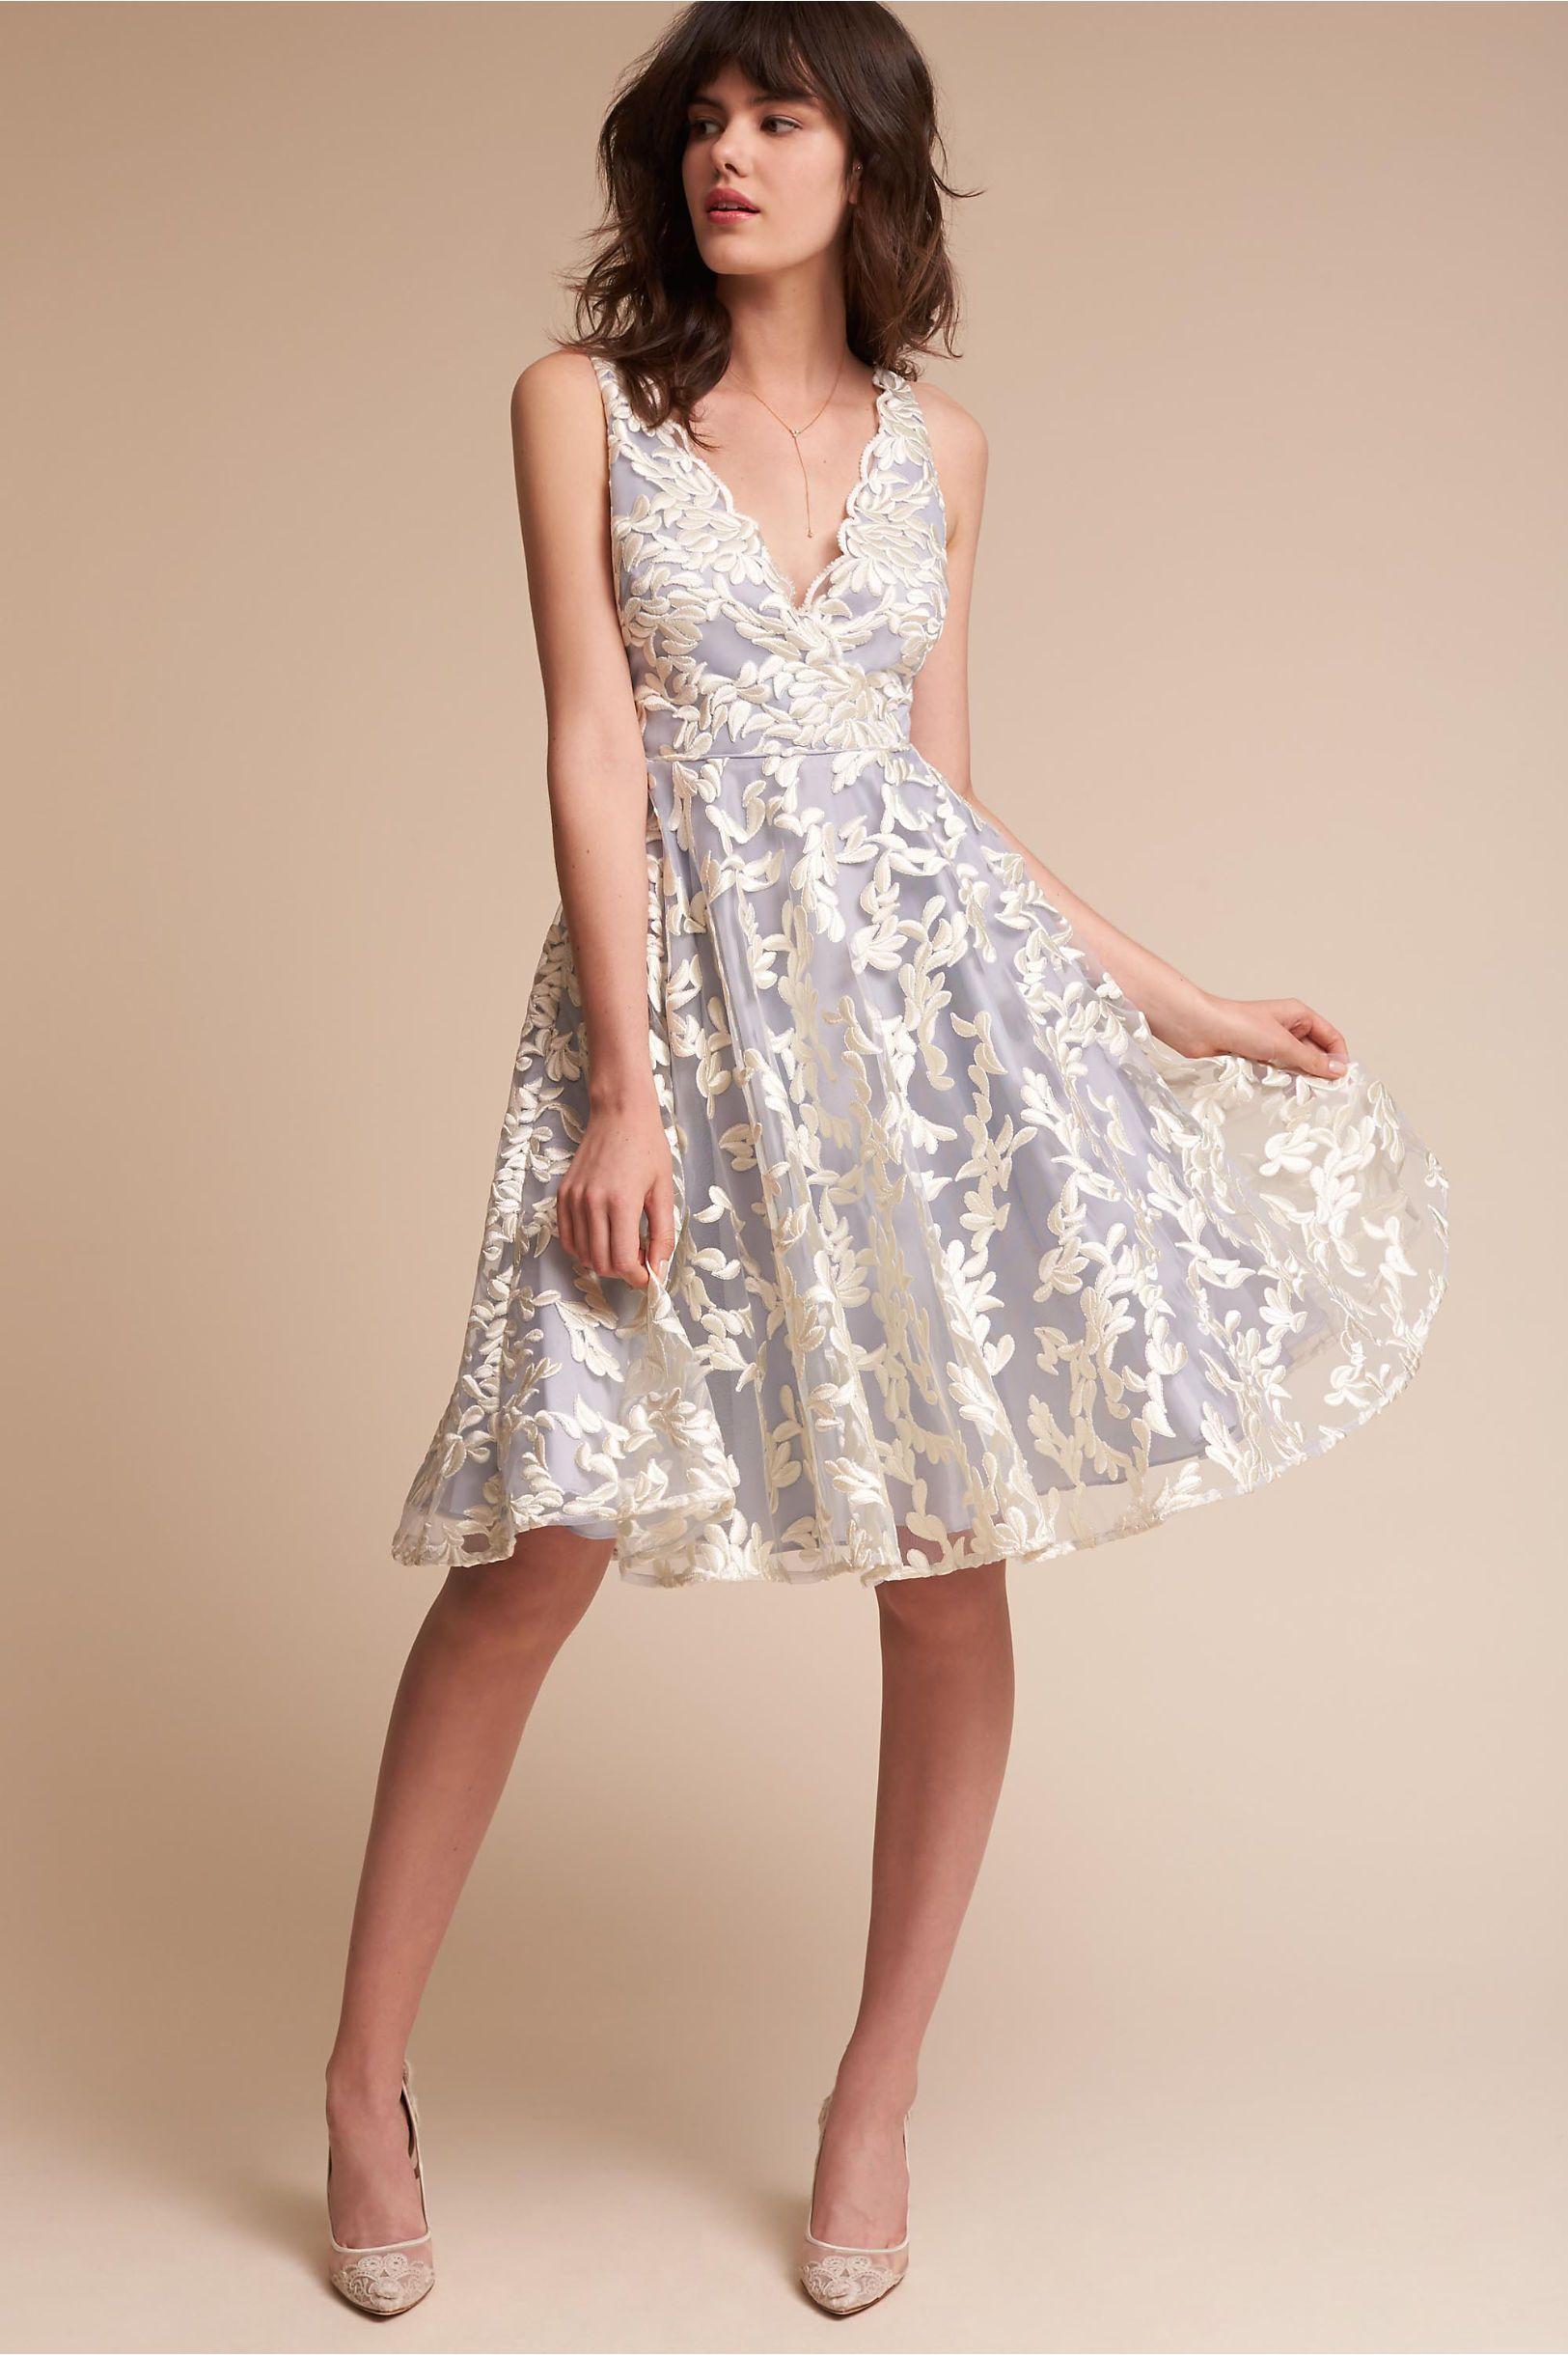 ba9b494c305b BHLDN Abbey Dress in Bride Little White Dresses